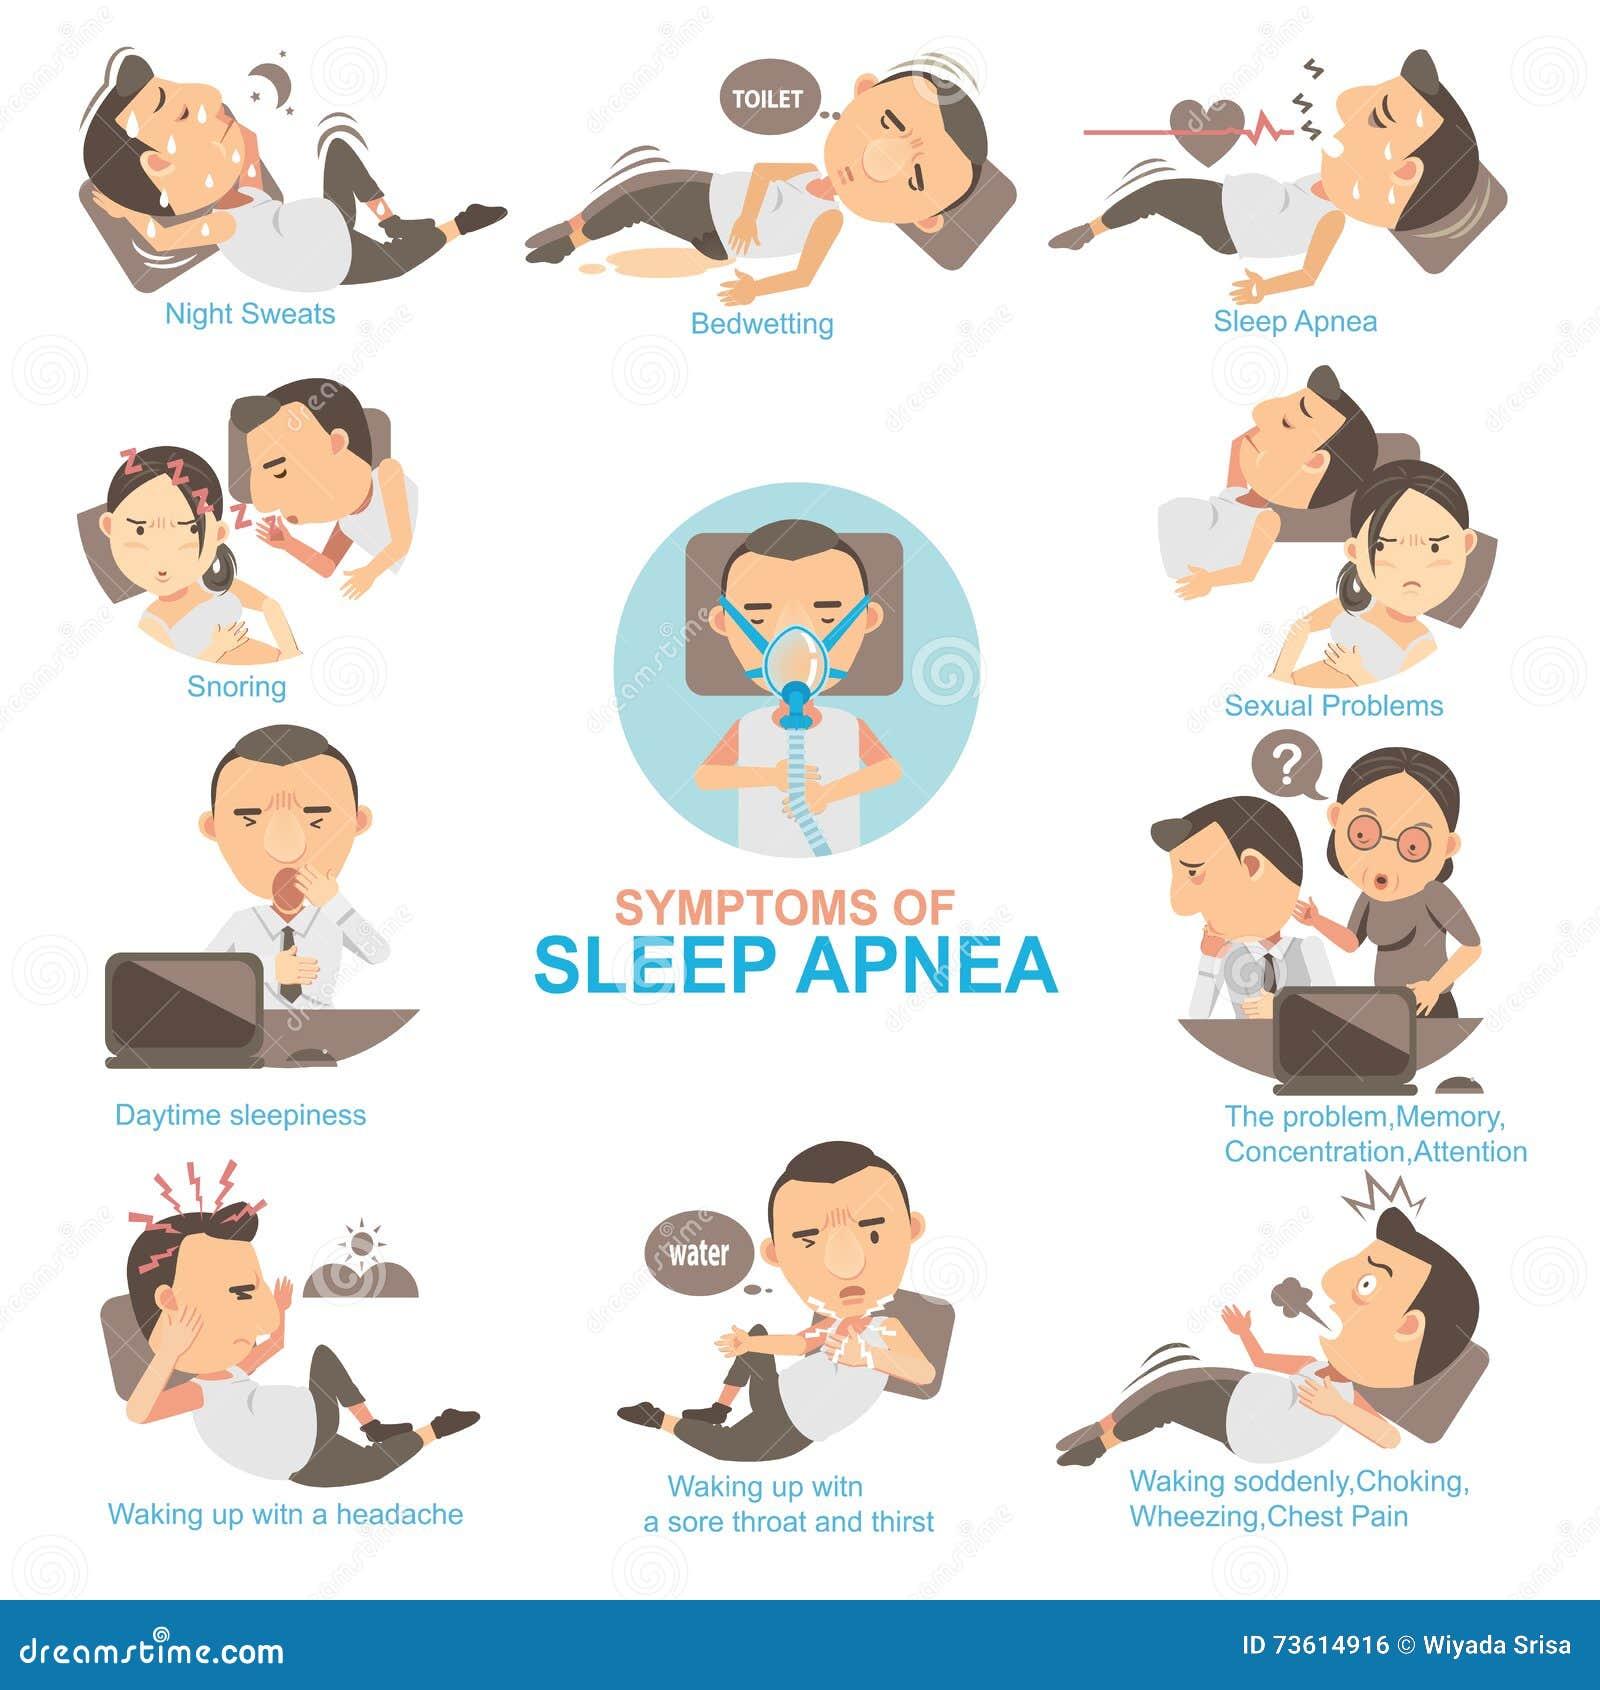 Z-Sleep Z-Sleep new pictures